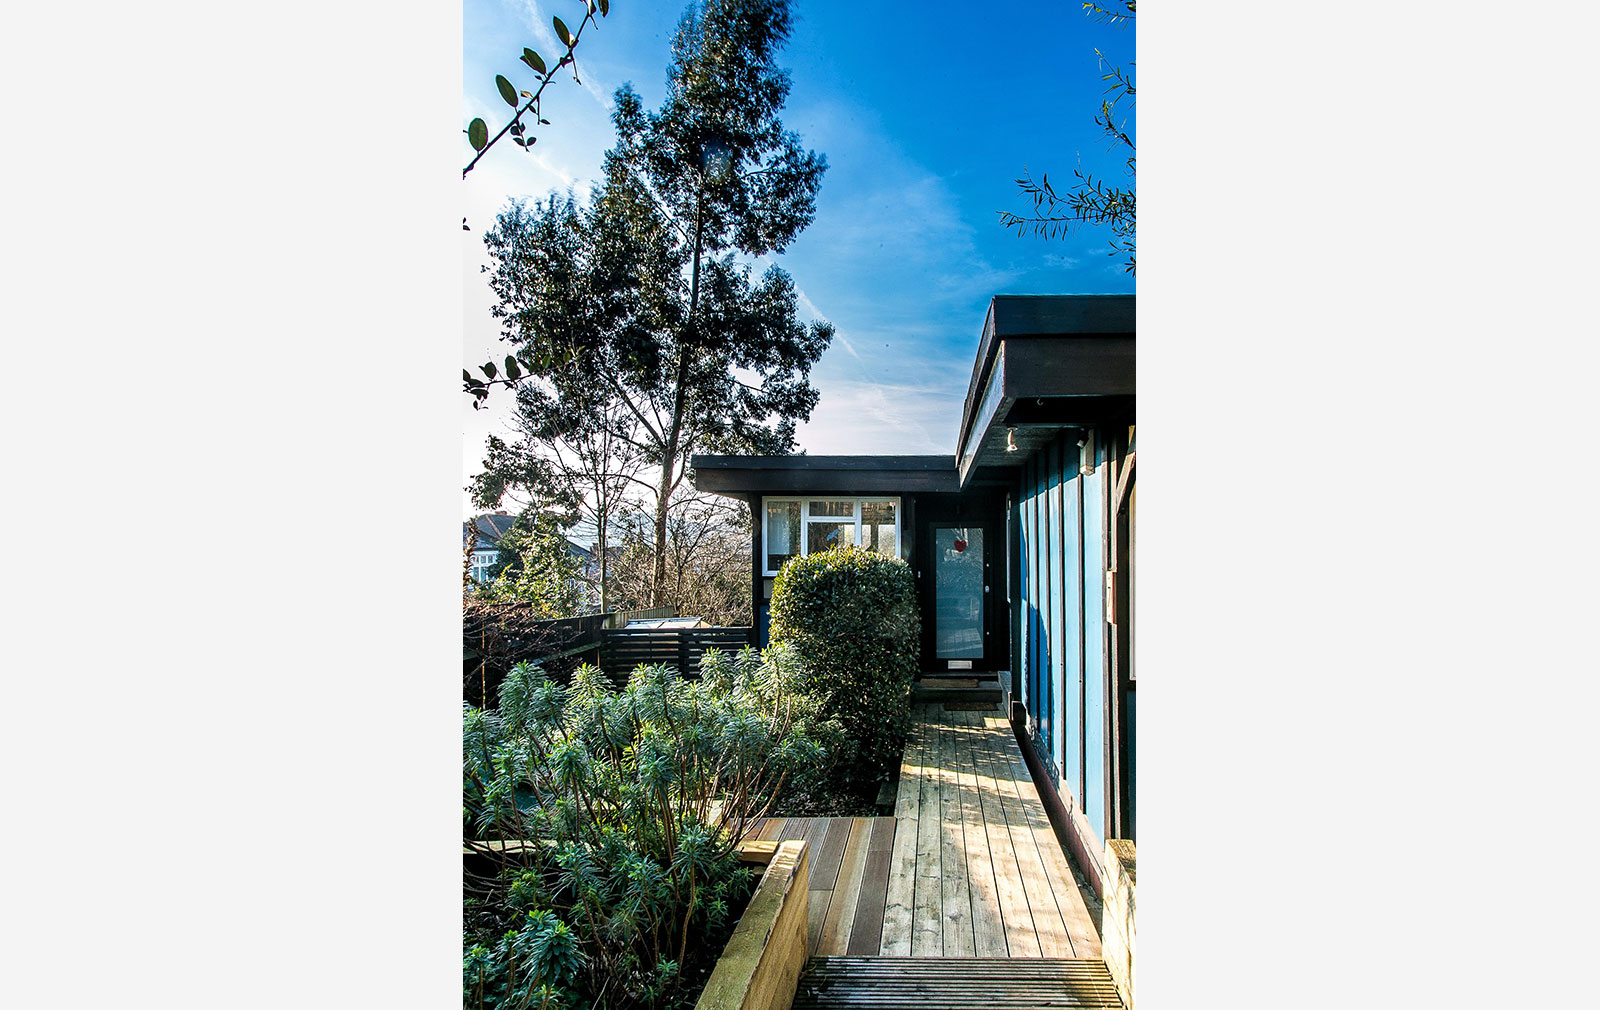 Open House London: Segal Close self-built houses